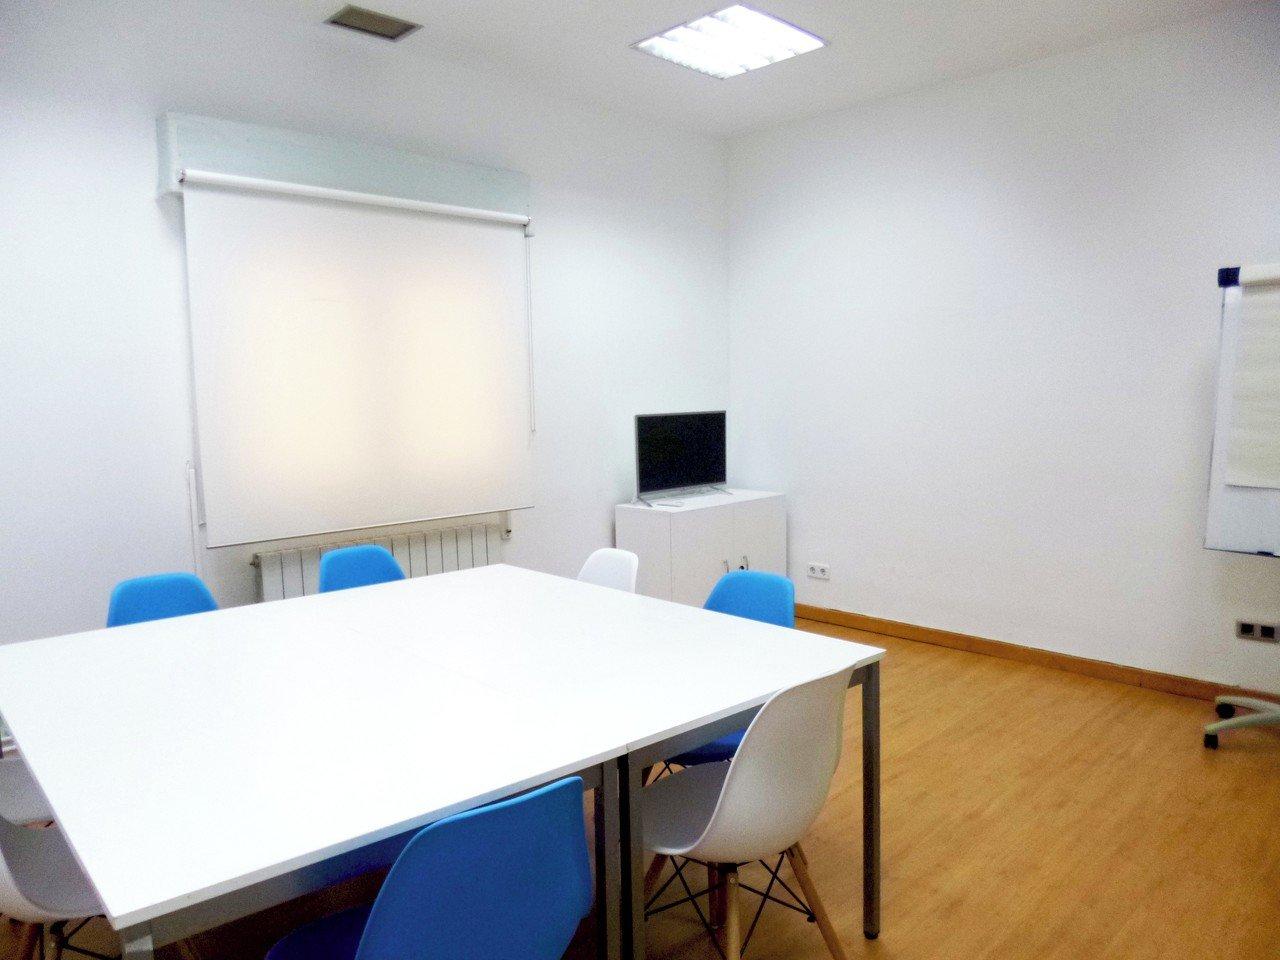 Madrid training rooms Meetingraum WORK AND WIFI - ROOM1 image 7